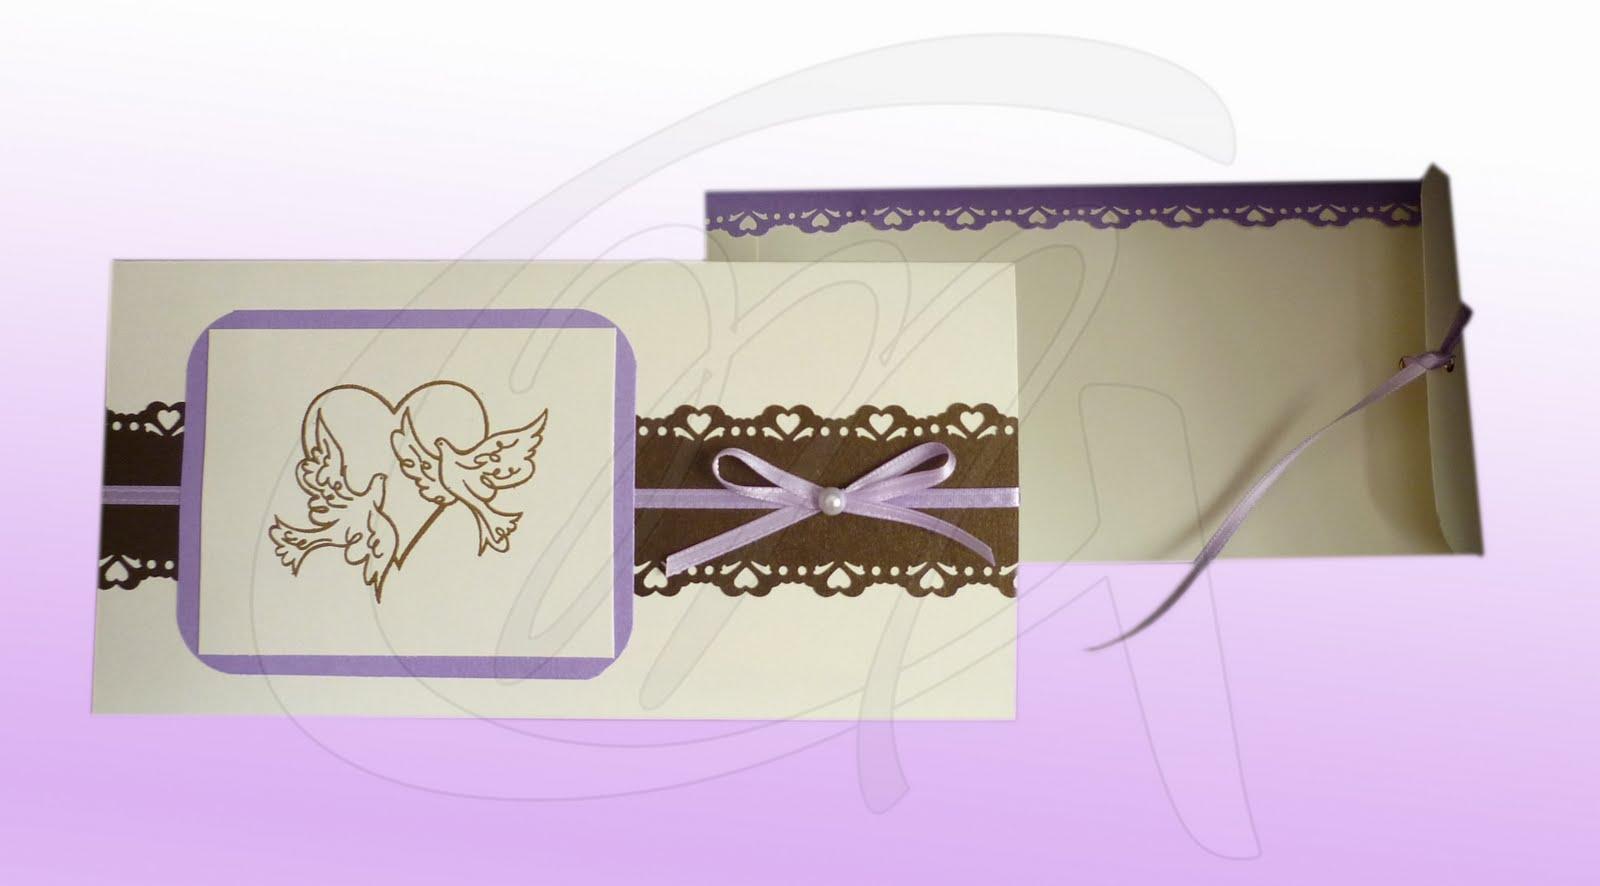 Auguri Matrimonio Busta : Auguri di carta card per matrimonio con busta e taschina